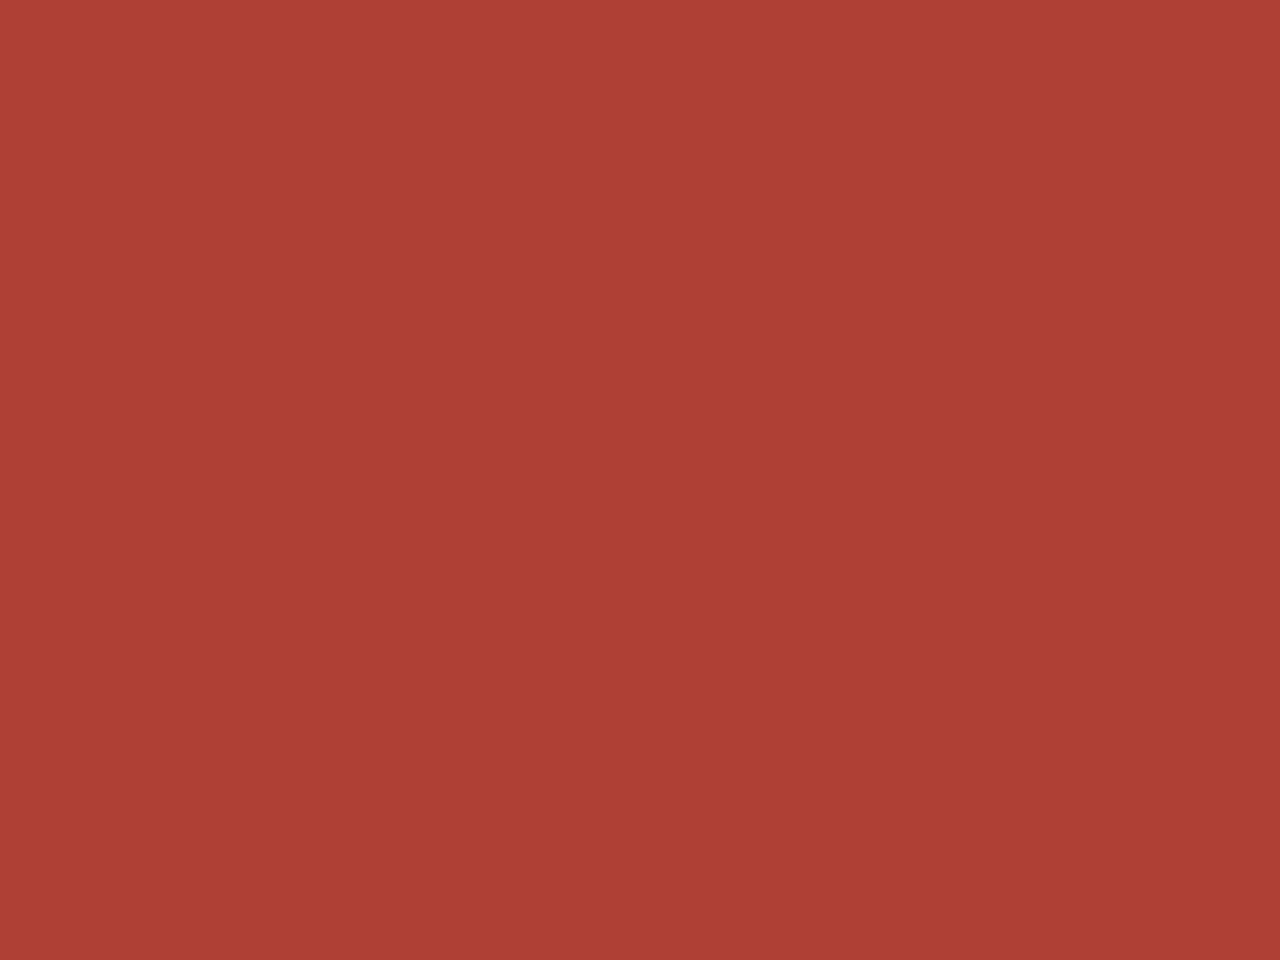 1280x960 Pale Carmine Solid Color Background